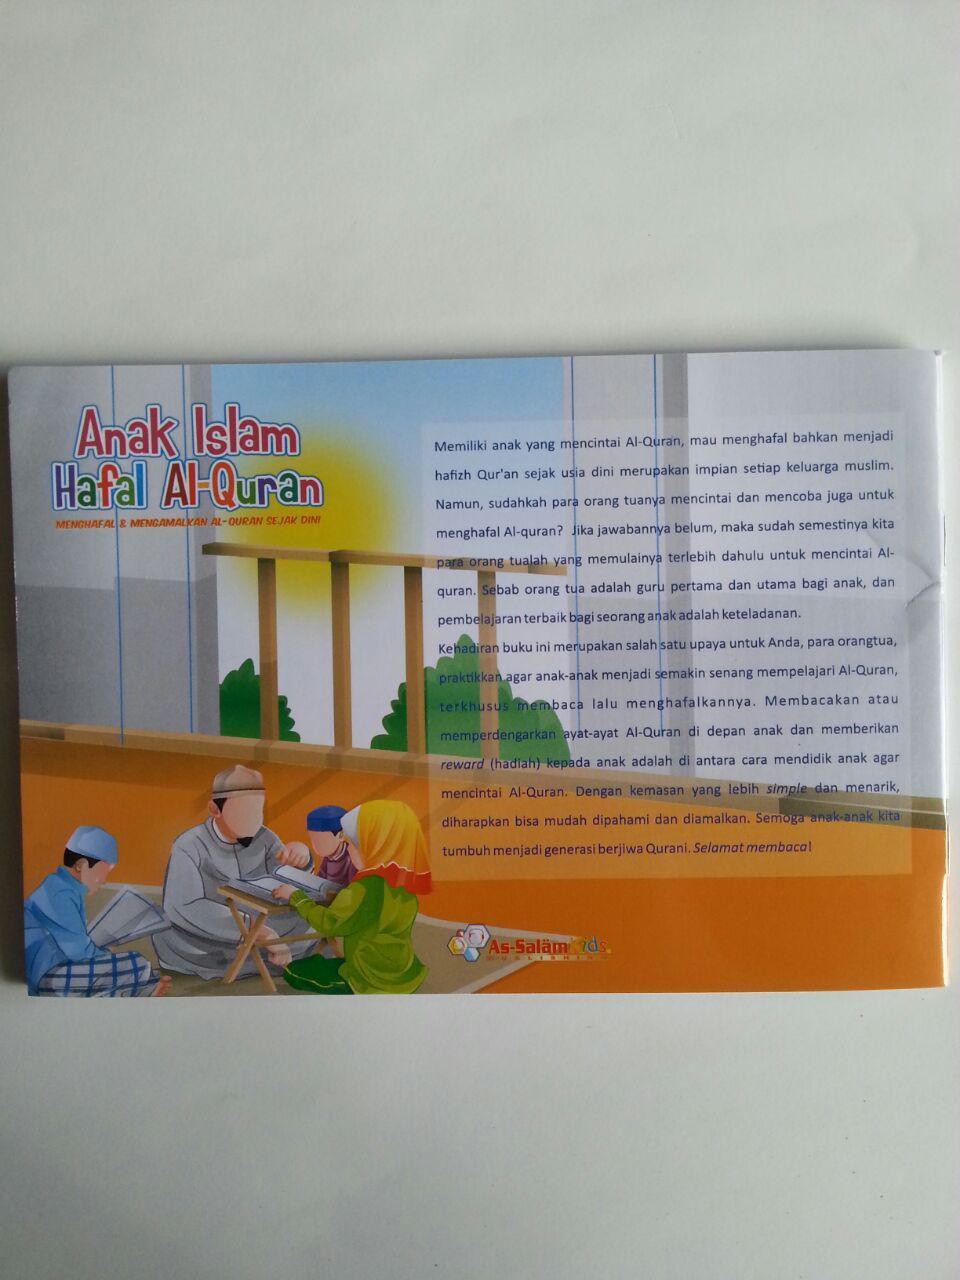 Buku Anak Islam Hafal Al-Quran Sejak Dini cover